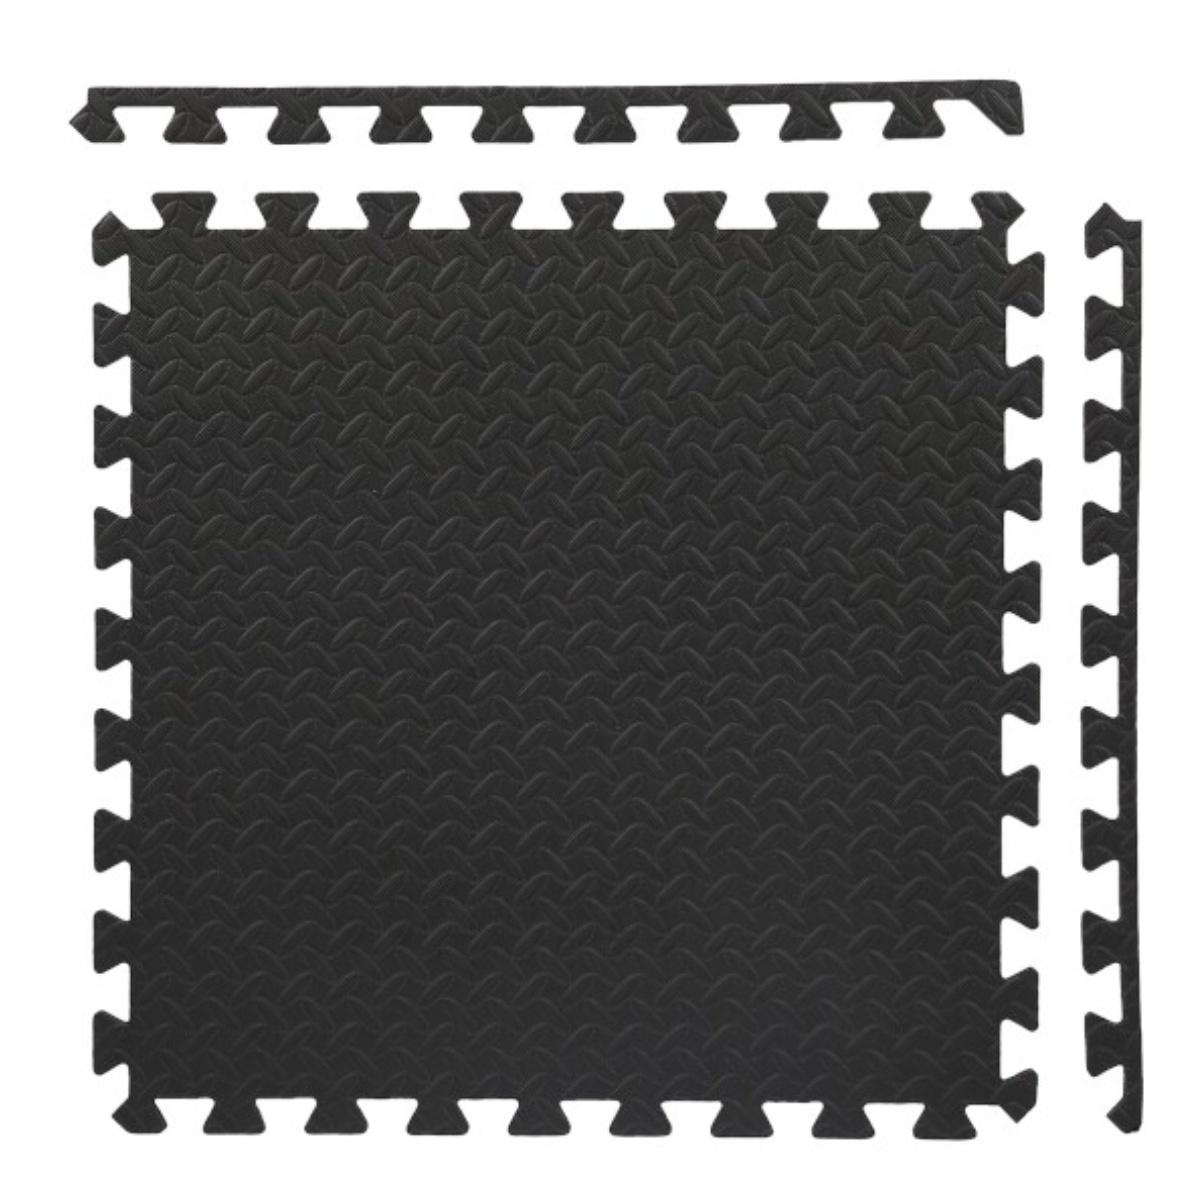 Podložka pod fitness stroje 60 x 60 x 1,2 (4ks)